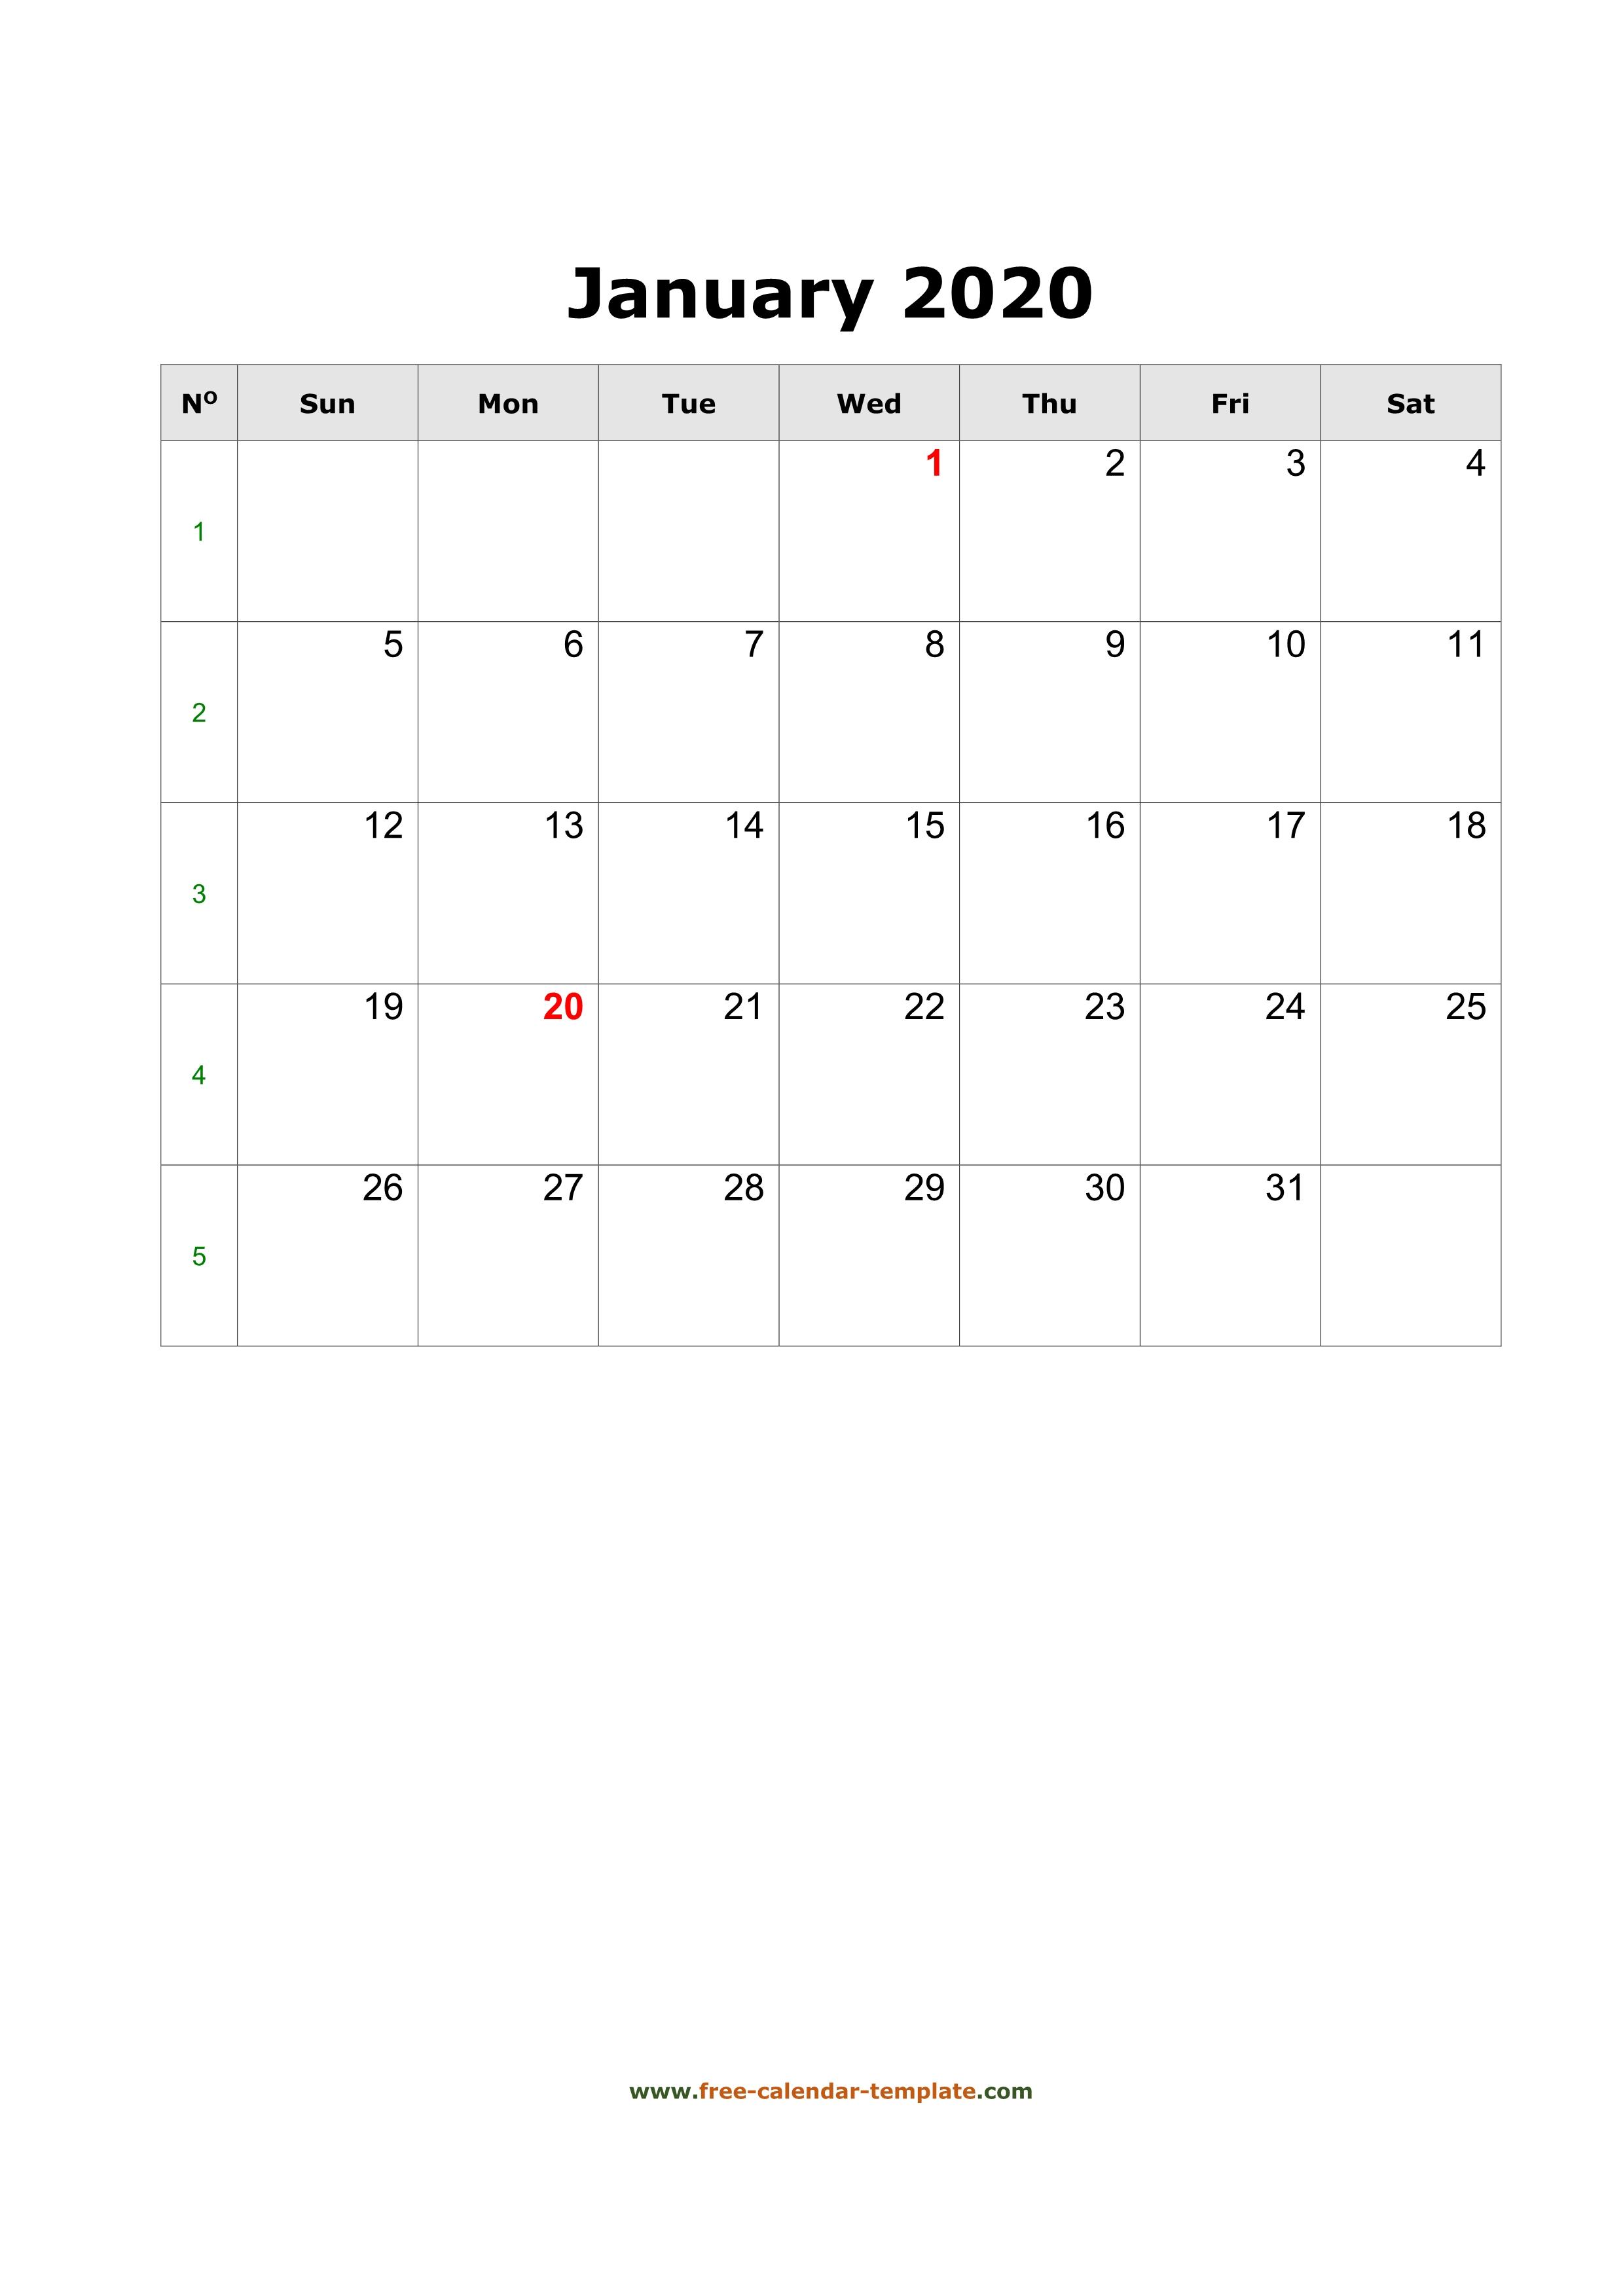 2020 January Calendar (Blank Vertical Template)   Free